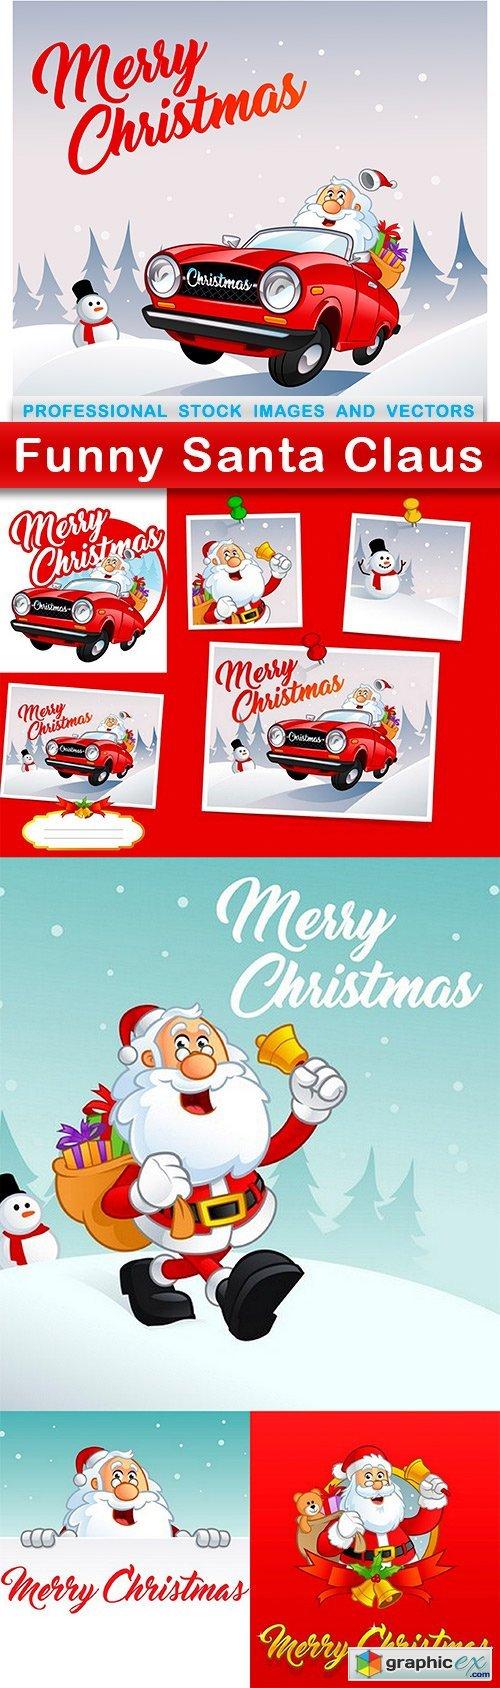 Funny Santa Claus - 7 EPS